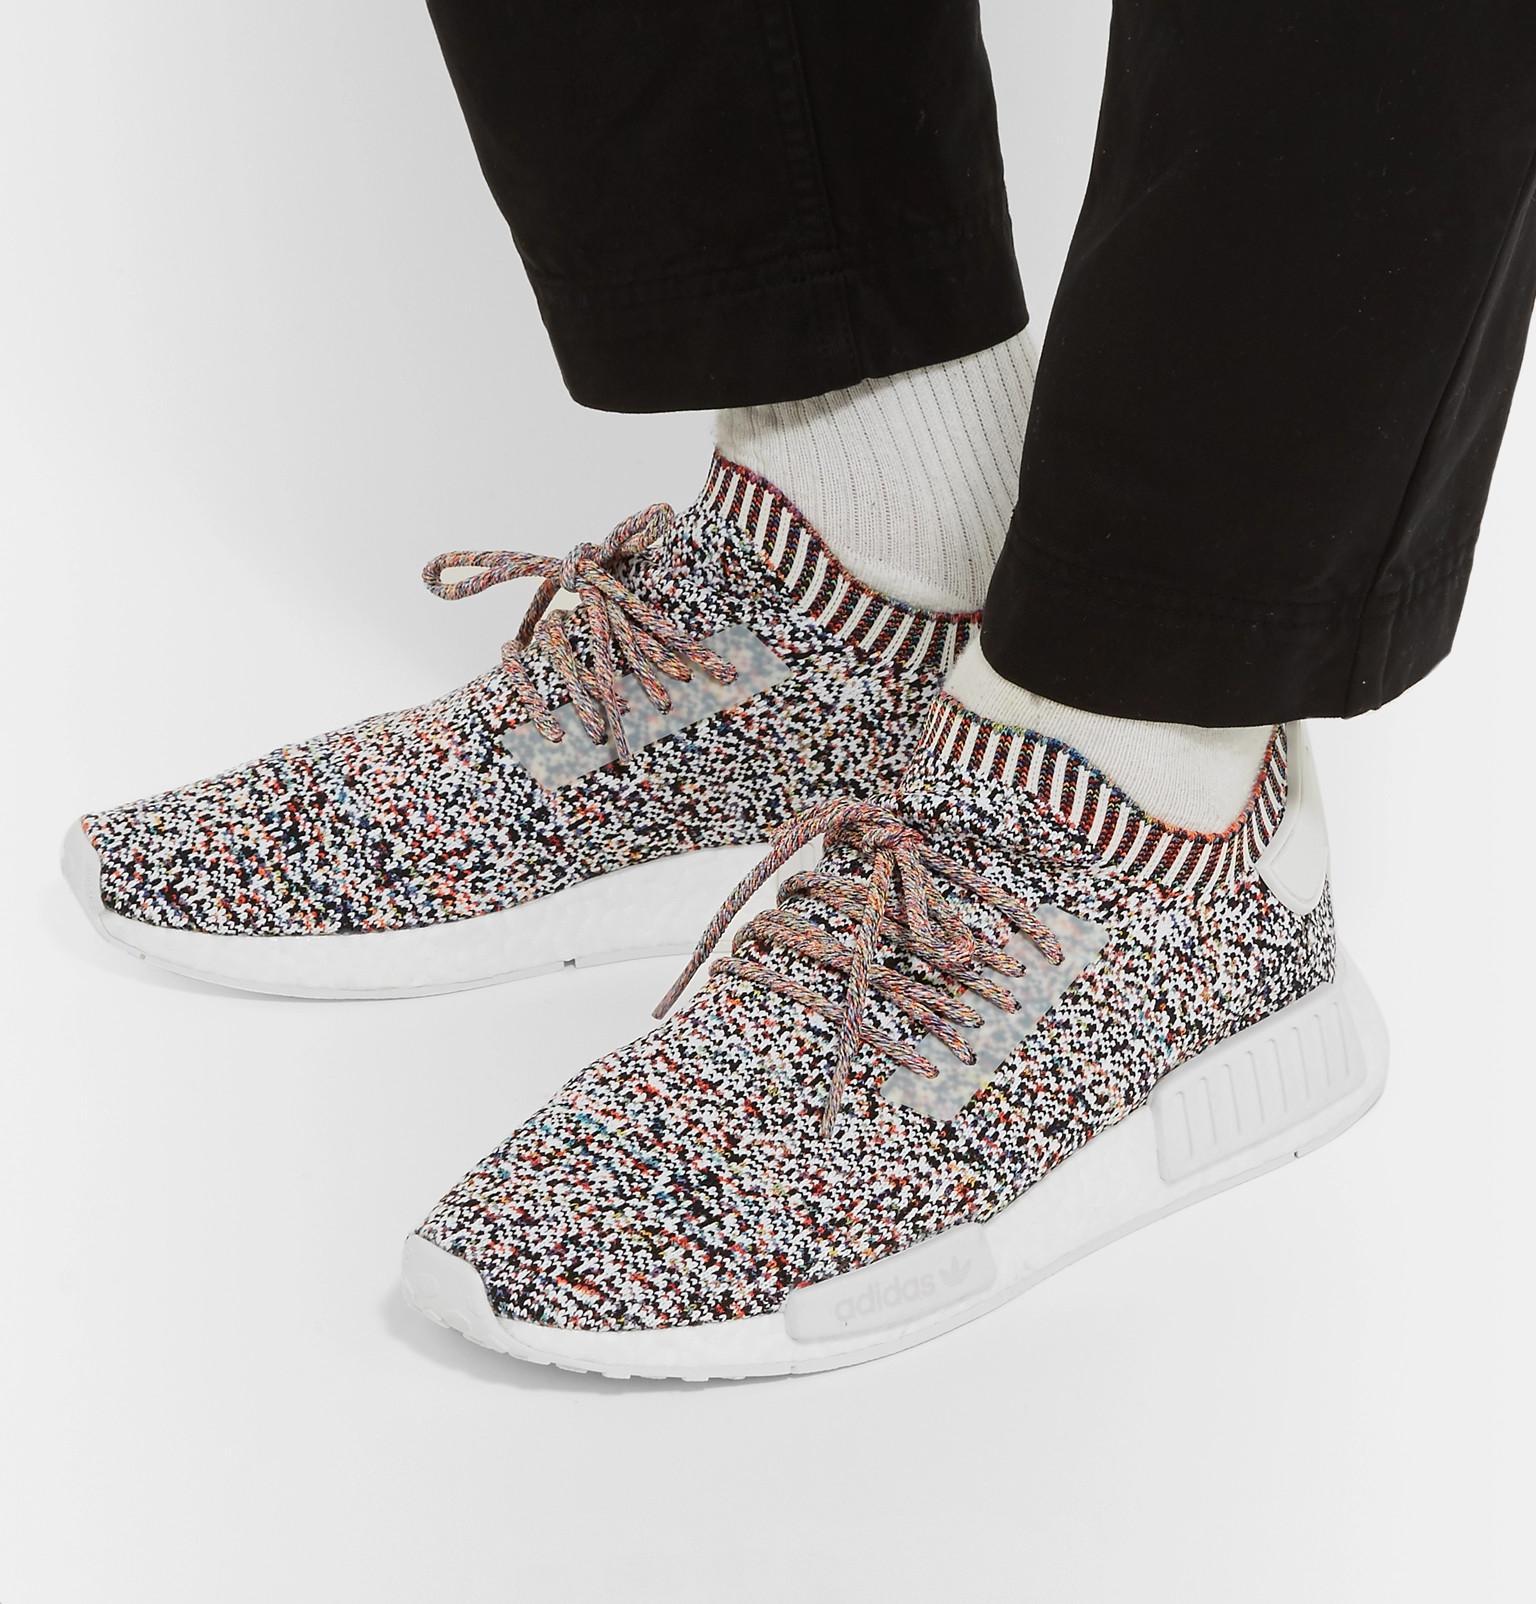 sale retailer 4b92f 60330 Lyst - adidas Originals Nmd R1 Primeknit Sneakers for Men